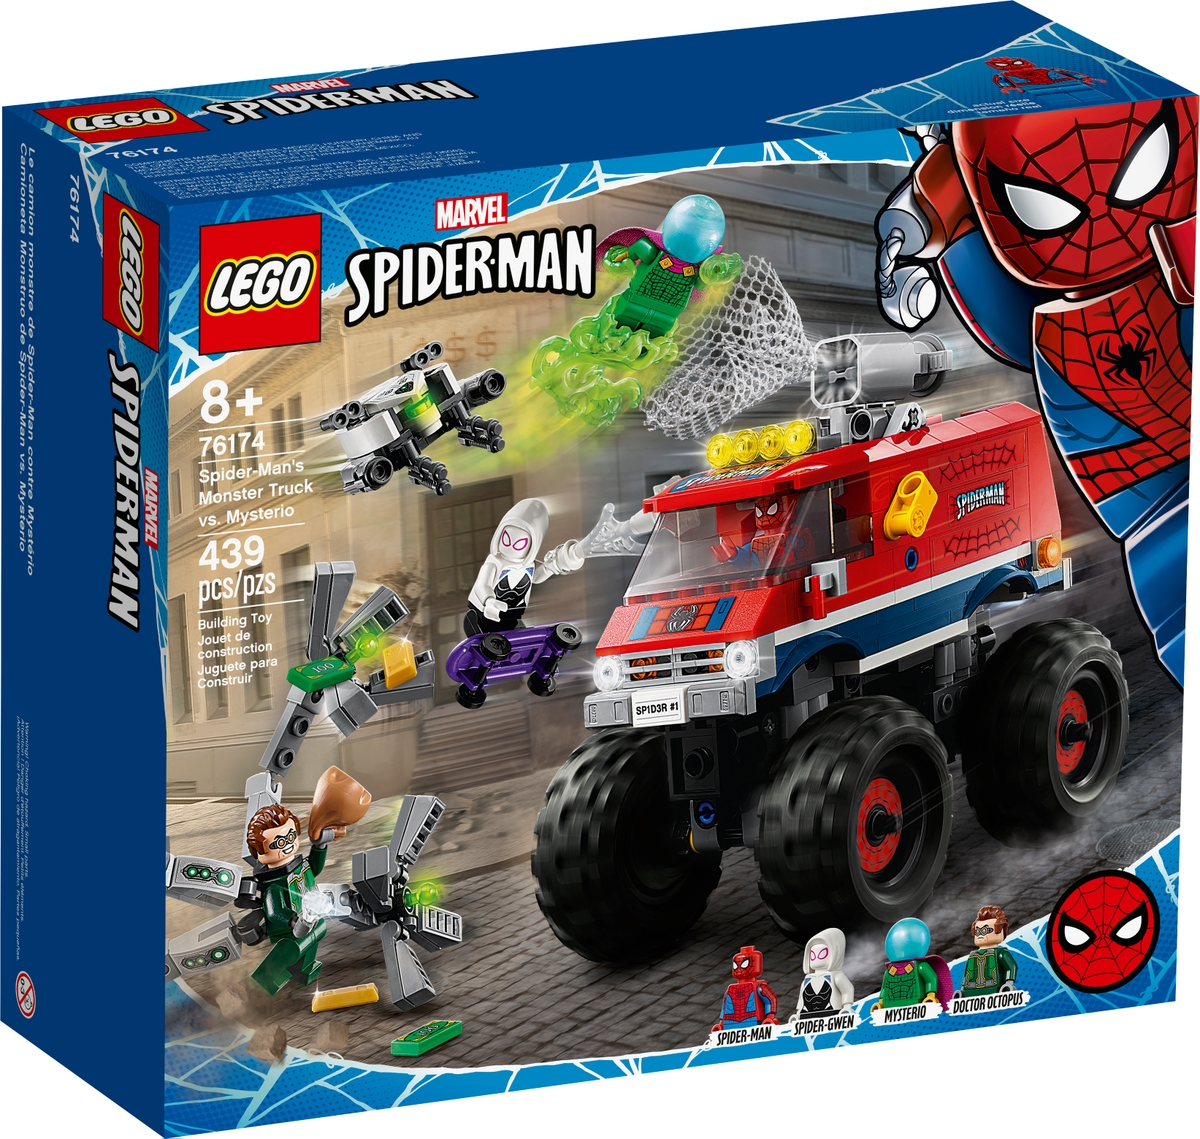 lego 76174 monster truck spider mana kontra mysterio